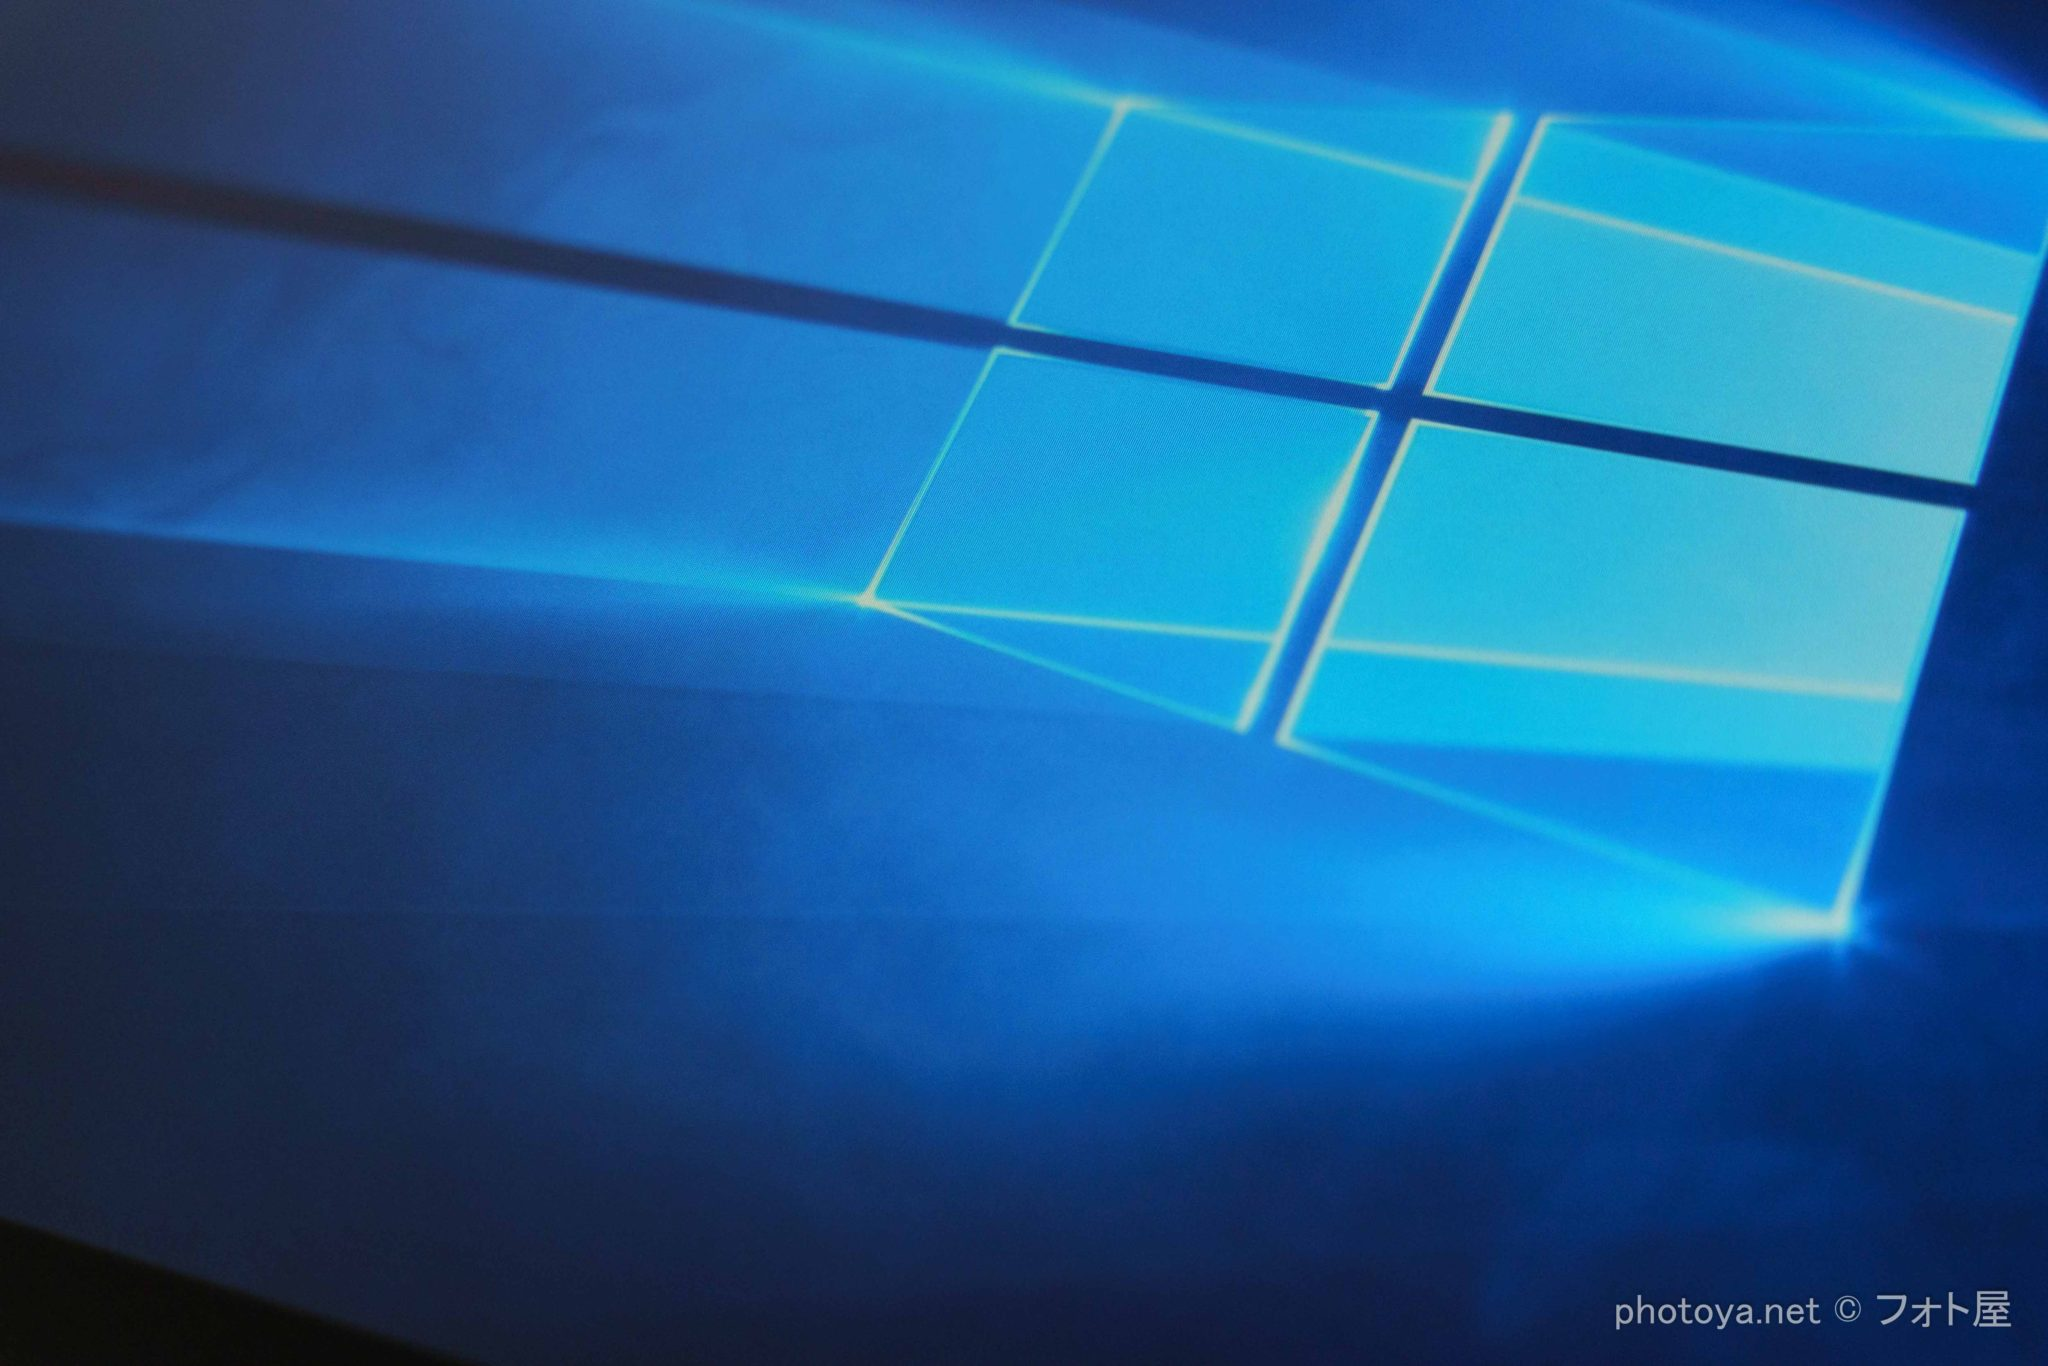 XP-PEN Artist Pro 画面解像度